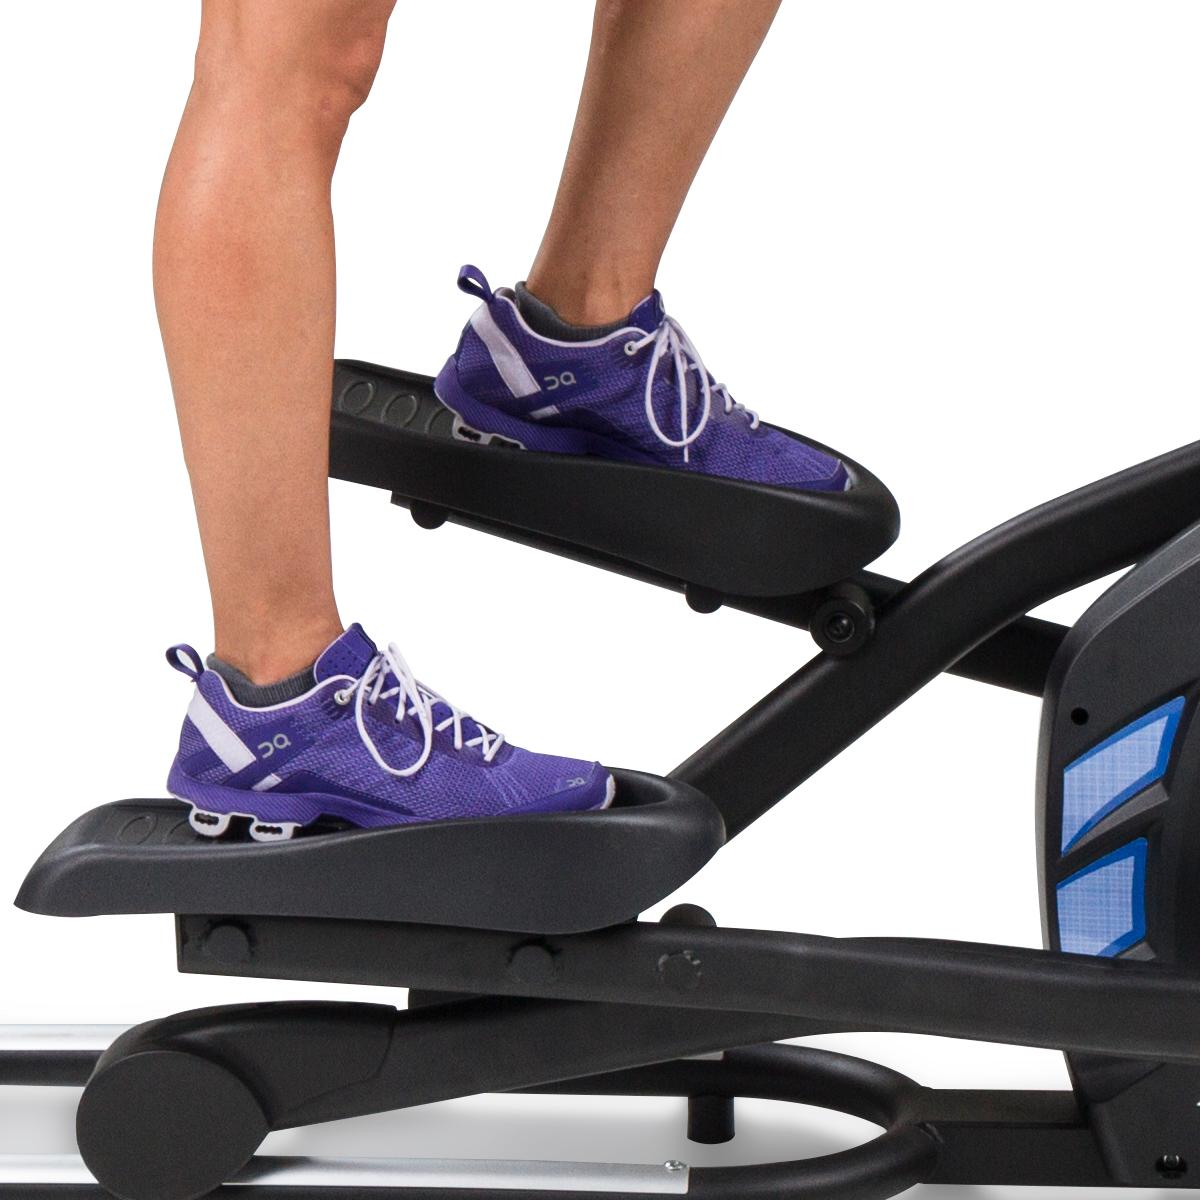 Amazon.com : XTERRA Fitness FS3.5 Elliptical : Sports